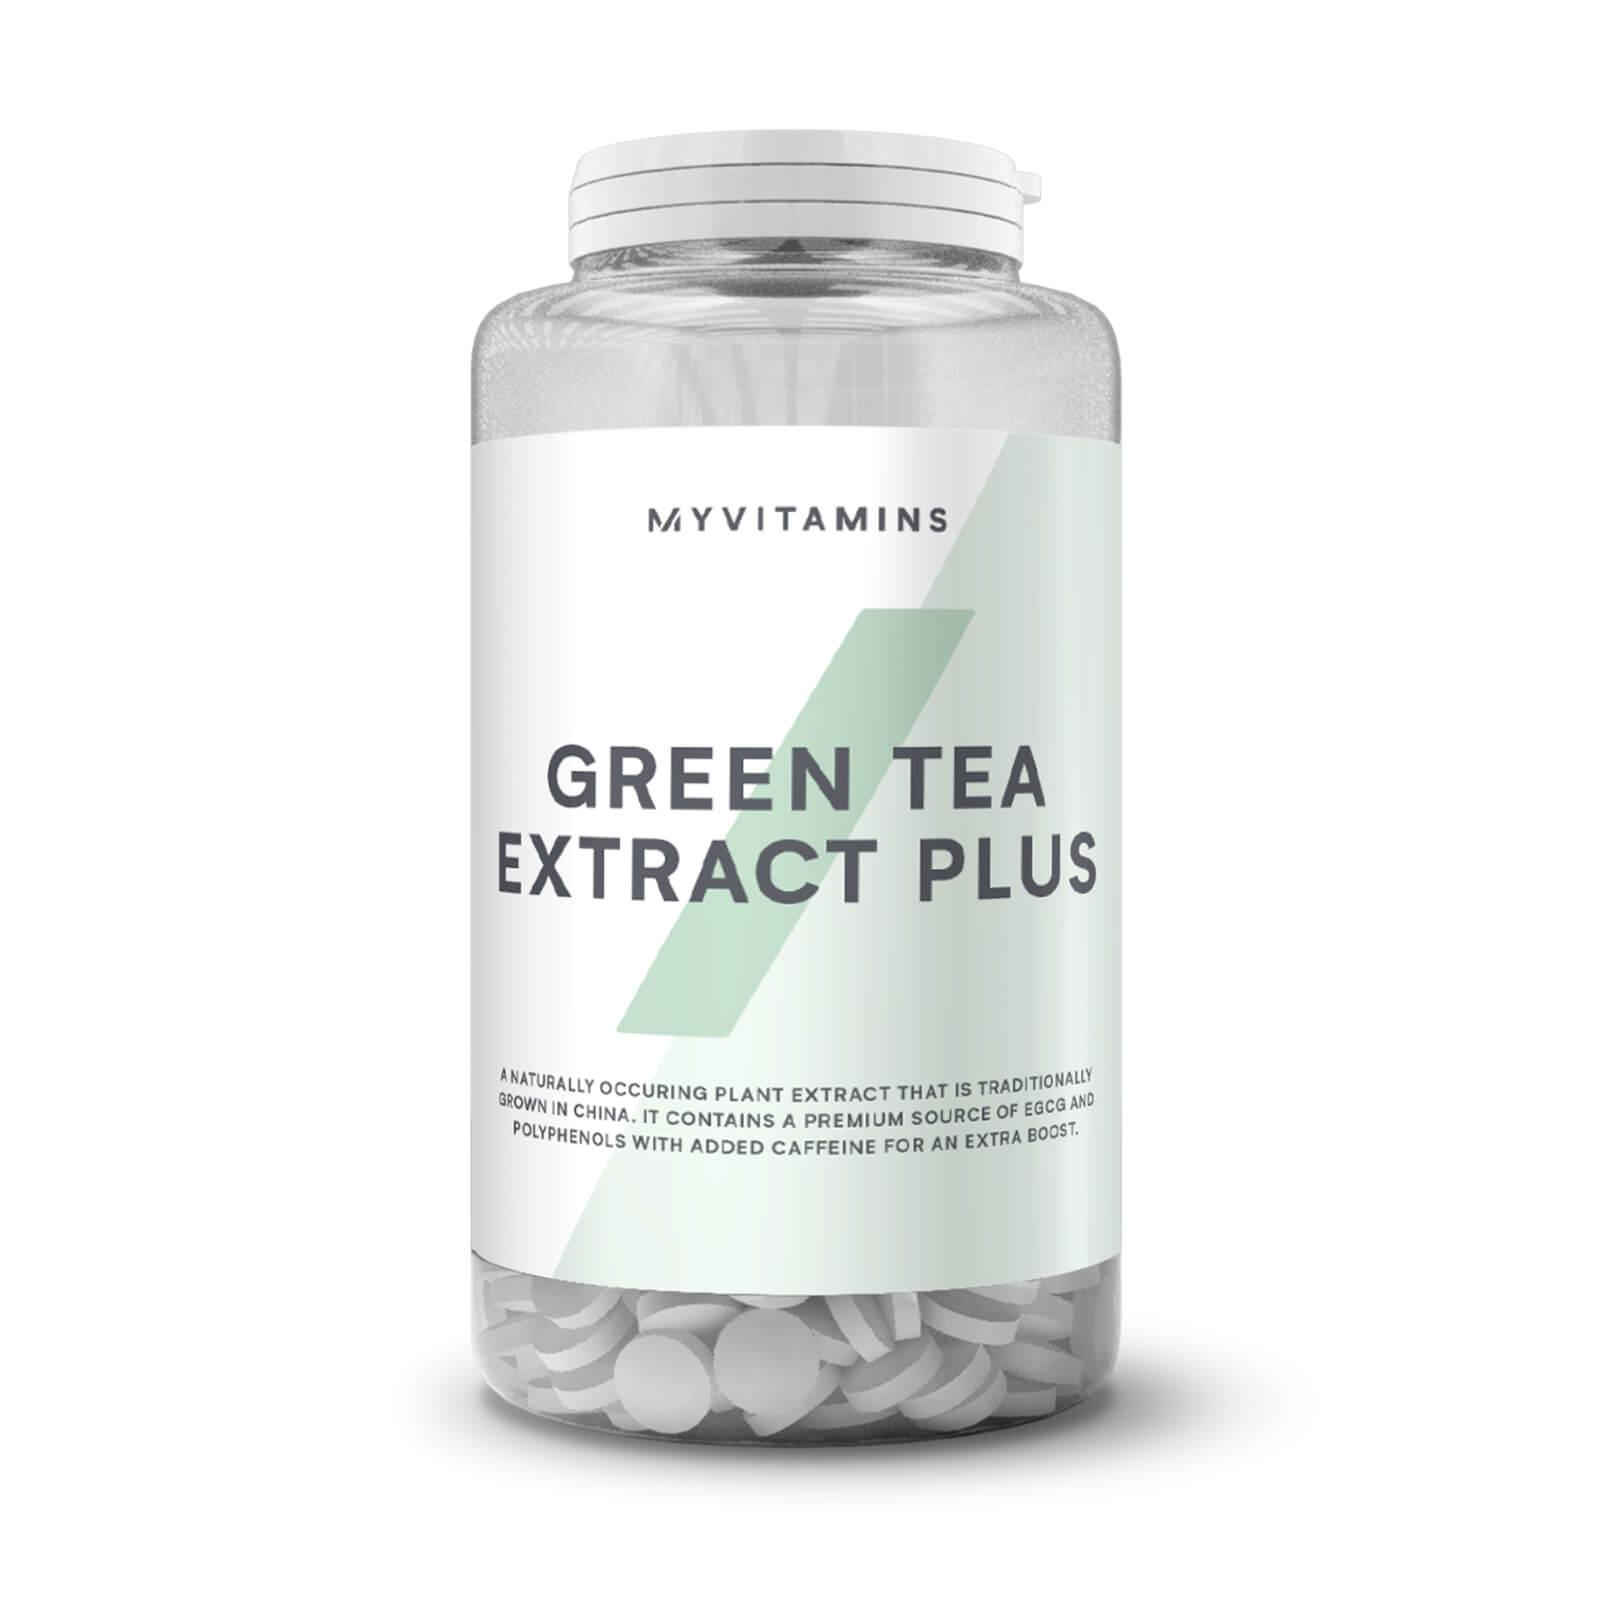 Estratto di Tè Verde (Myvitamins) 1 Month (30 Capsules)